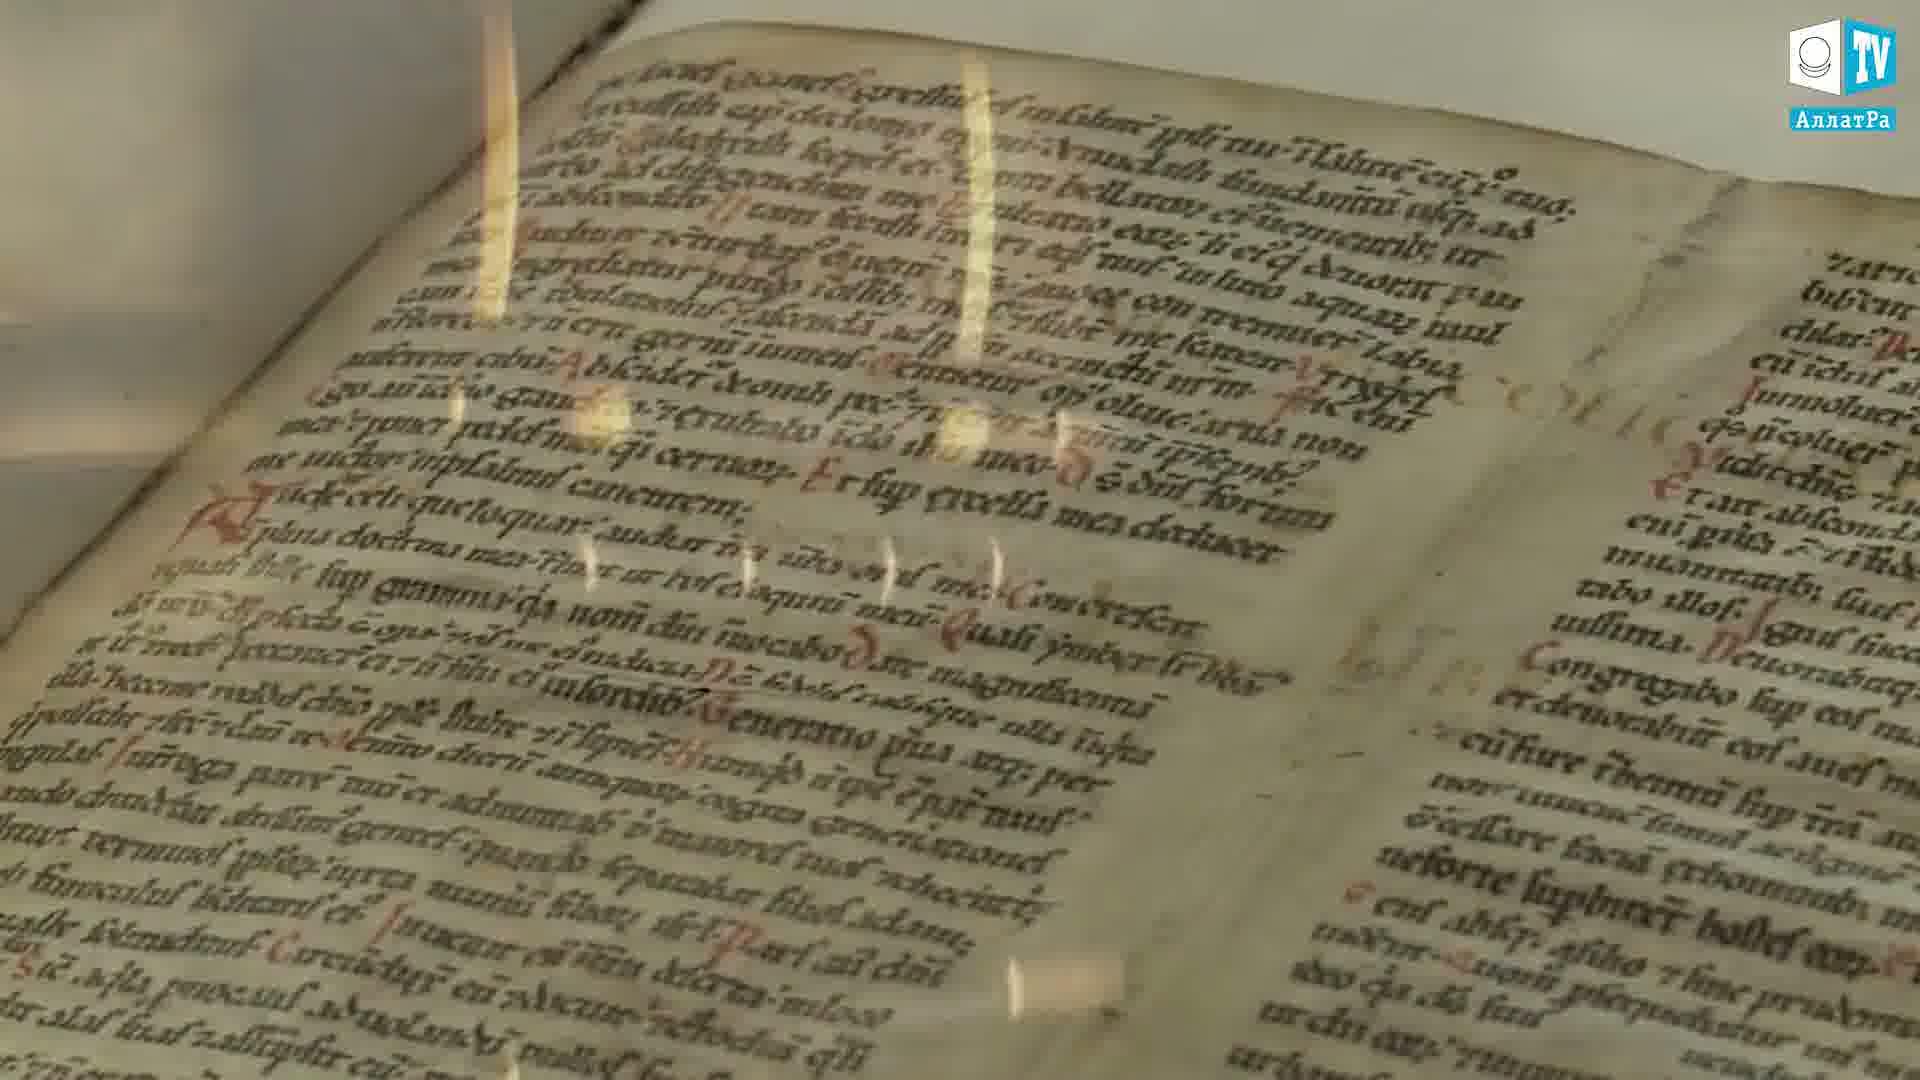 Starodávné texty 3. Foto